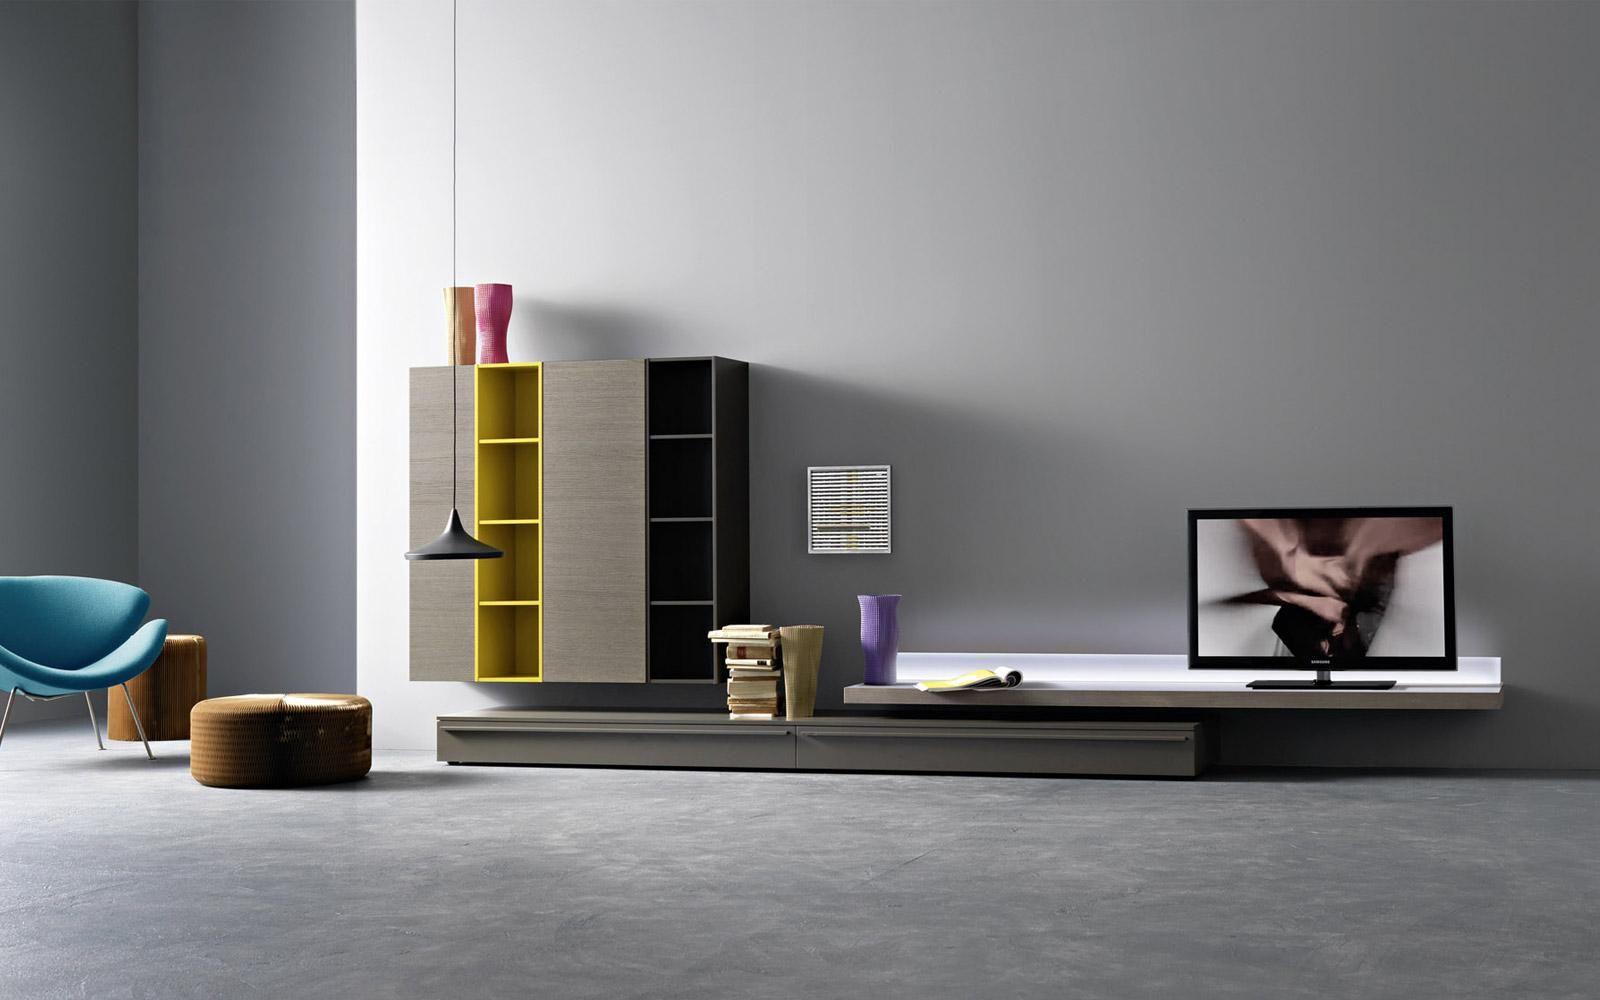 San Giacomo Tv Wand Lampo L2 17 Modernes Wohnen Pinterest  # Moderne Table A Tv